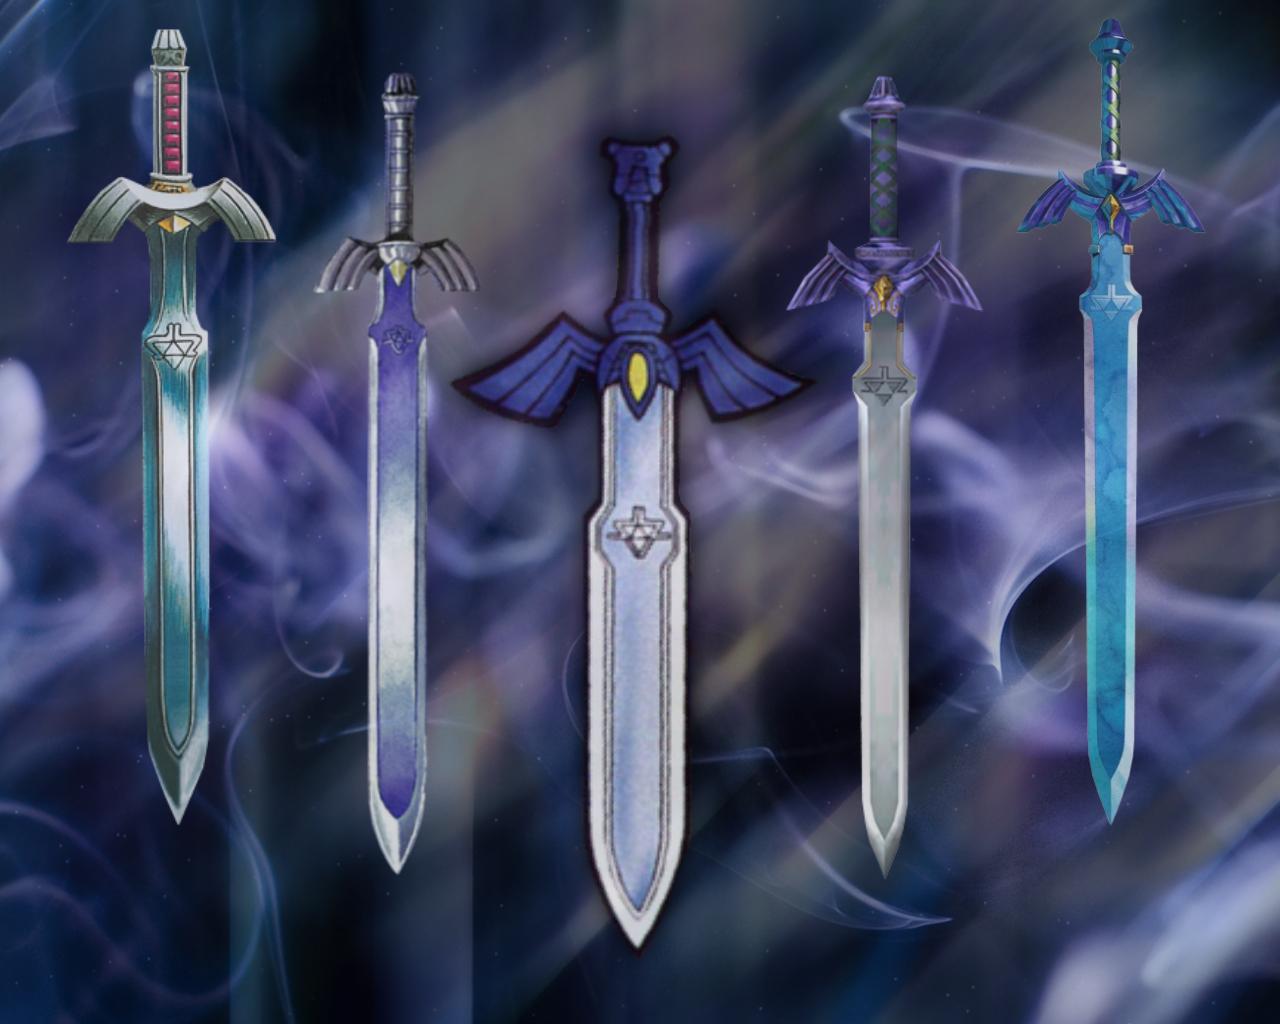 Master Swords by JocelynJEG 1280x1024